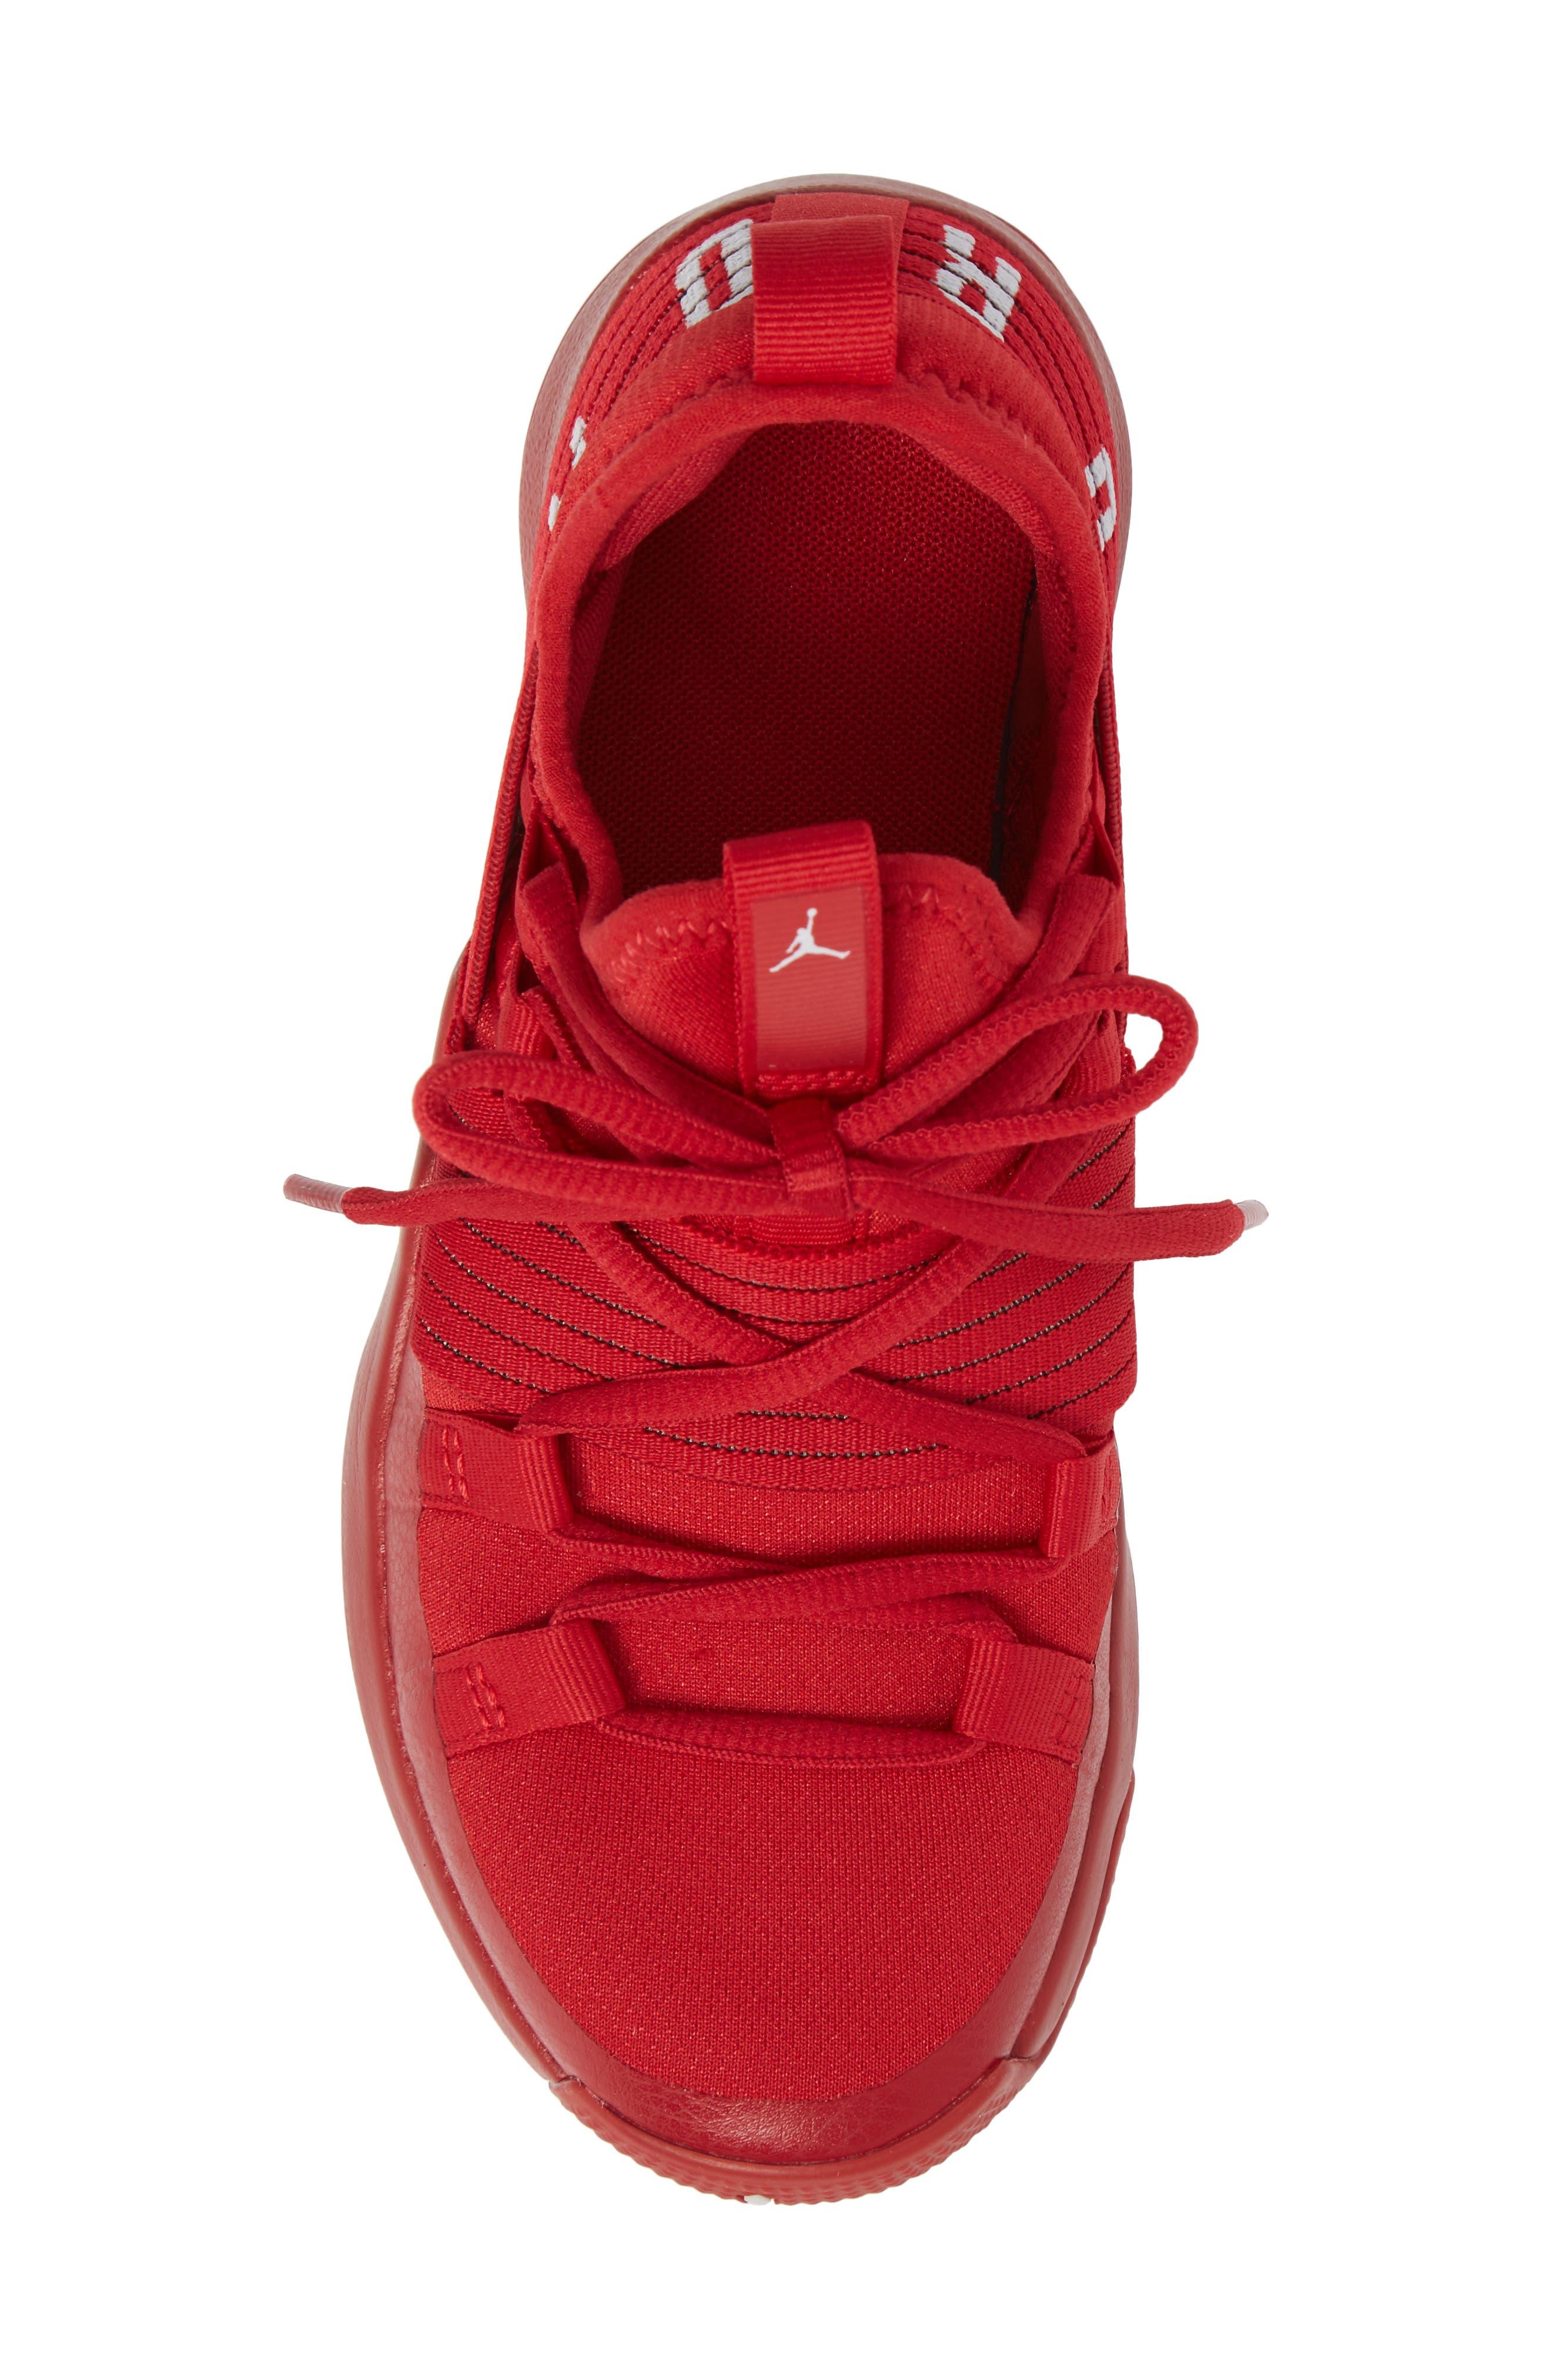 Trainer Pro Training Shoe,                             Alternate thumbnail 5, color,                             Gym Red/ Pure Platinum